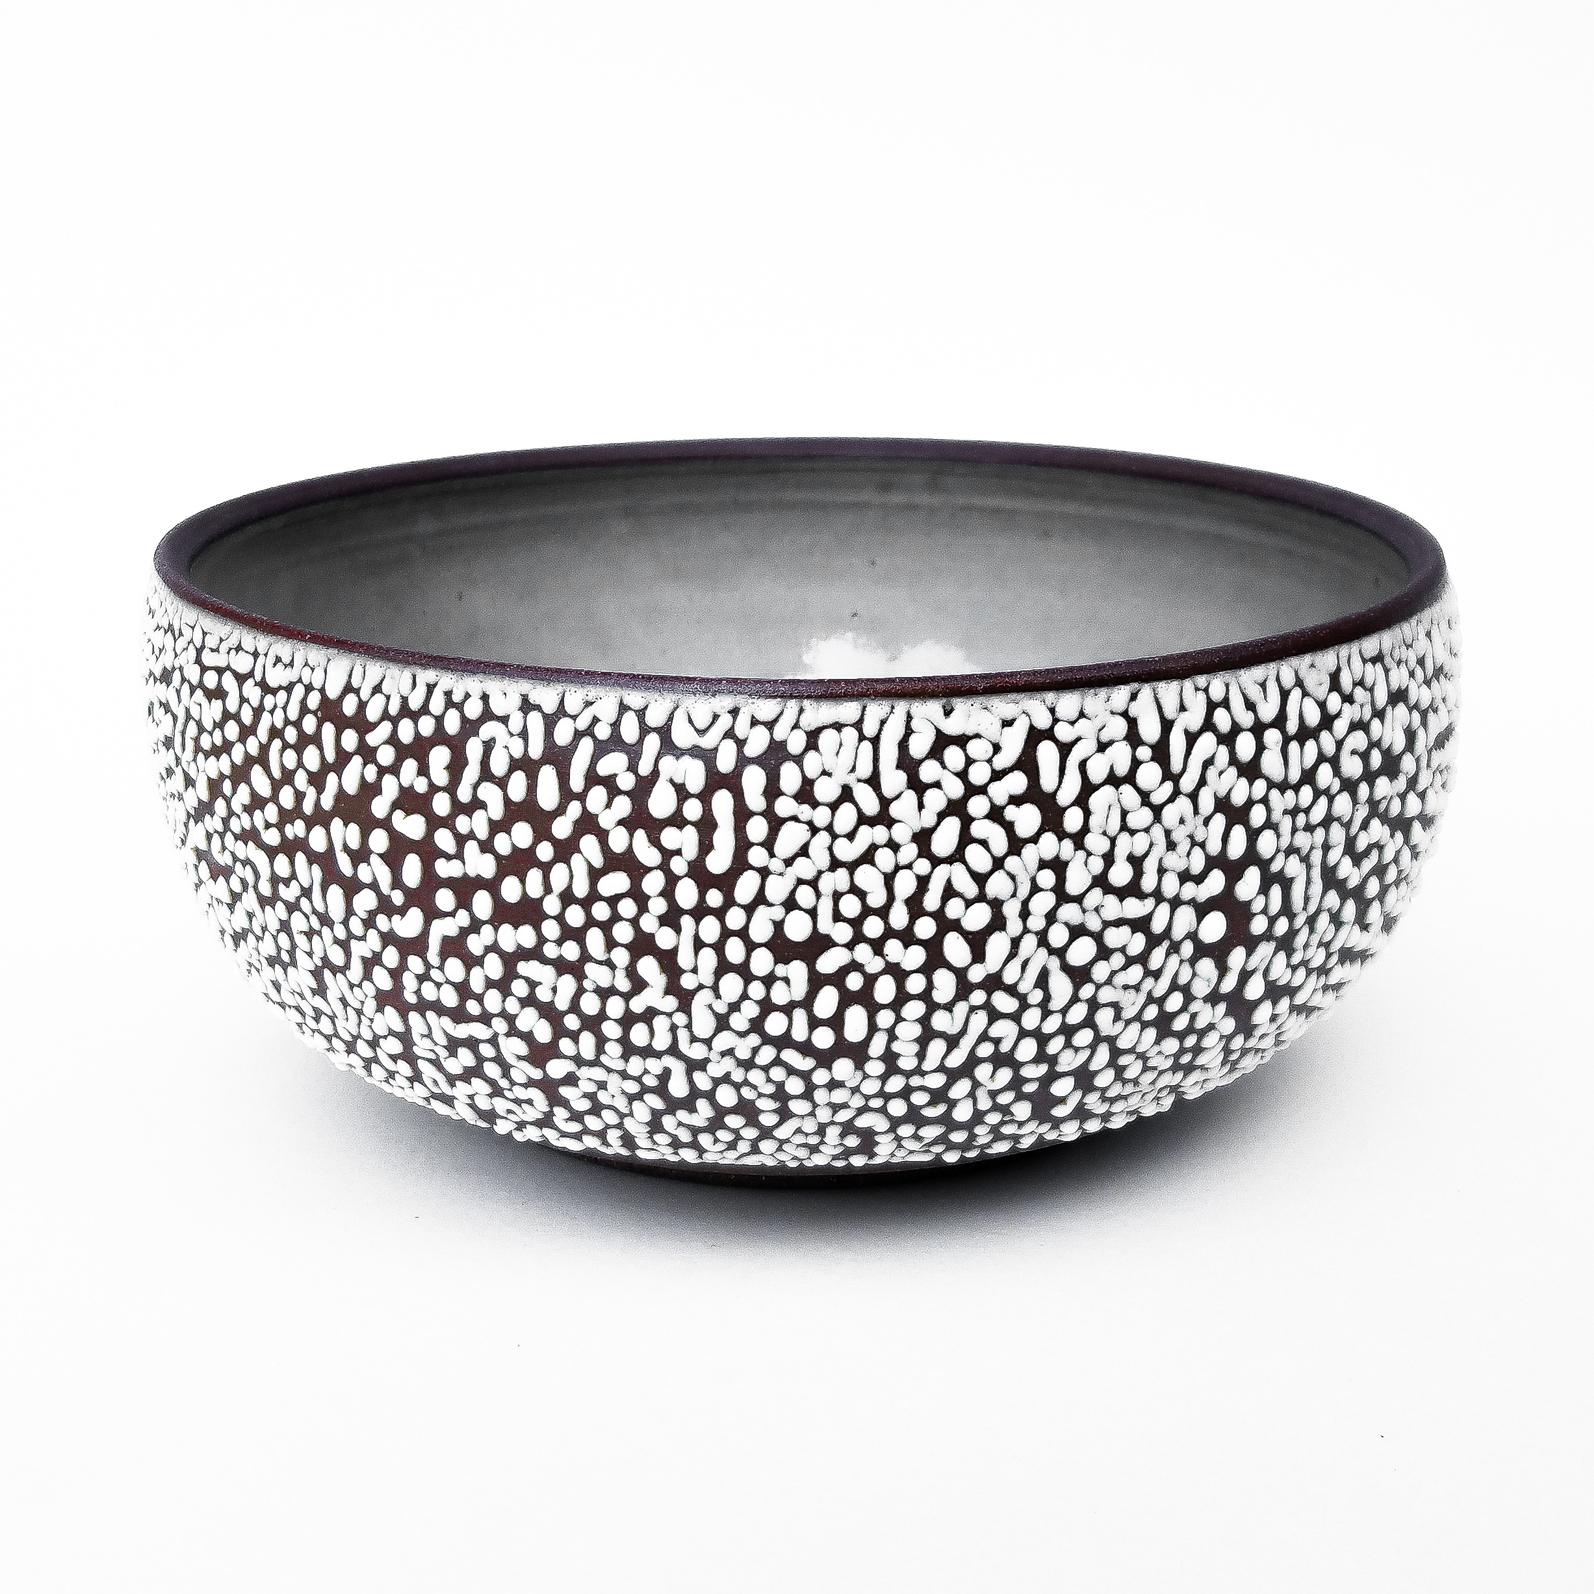 Ceramic_Erickson_$180_#1.jpg